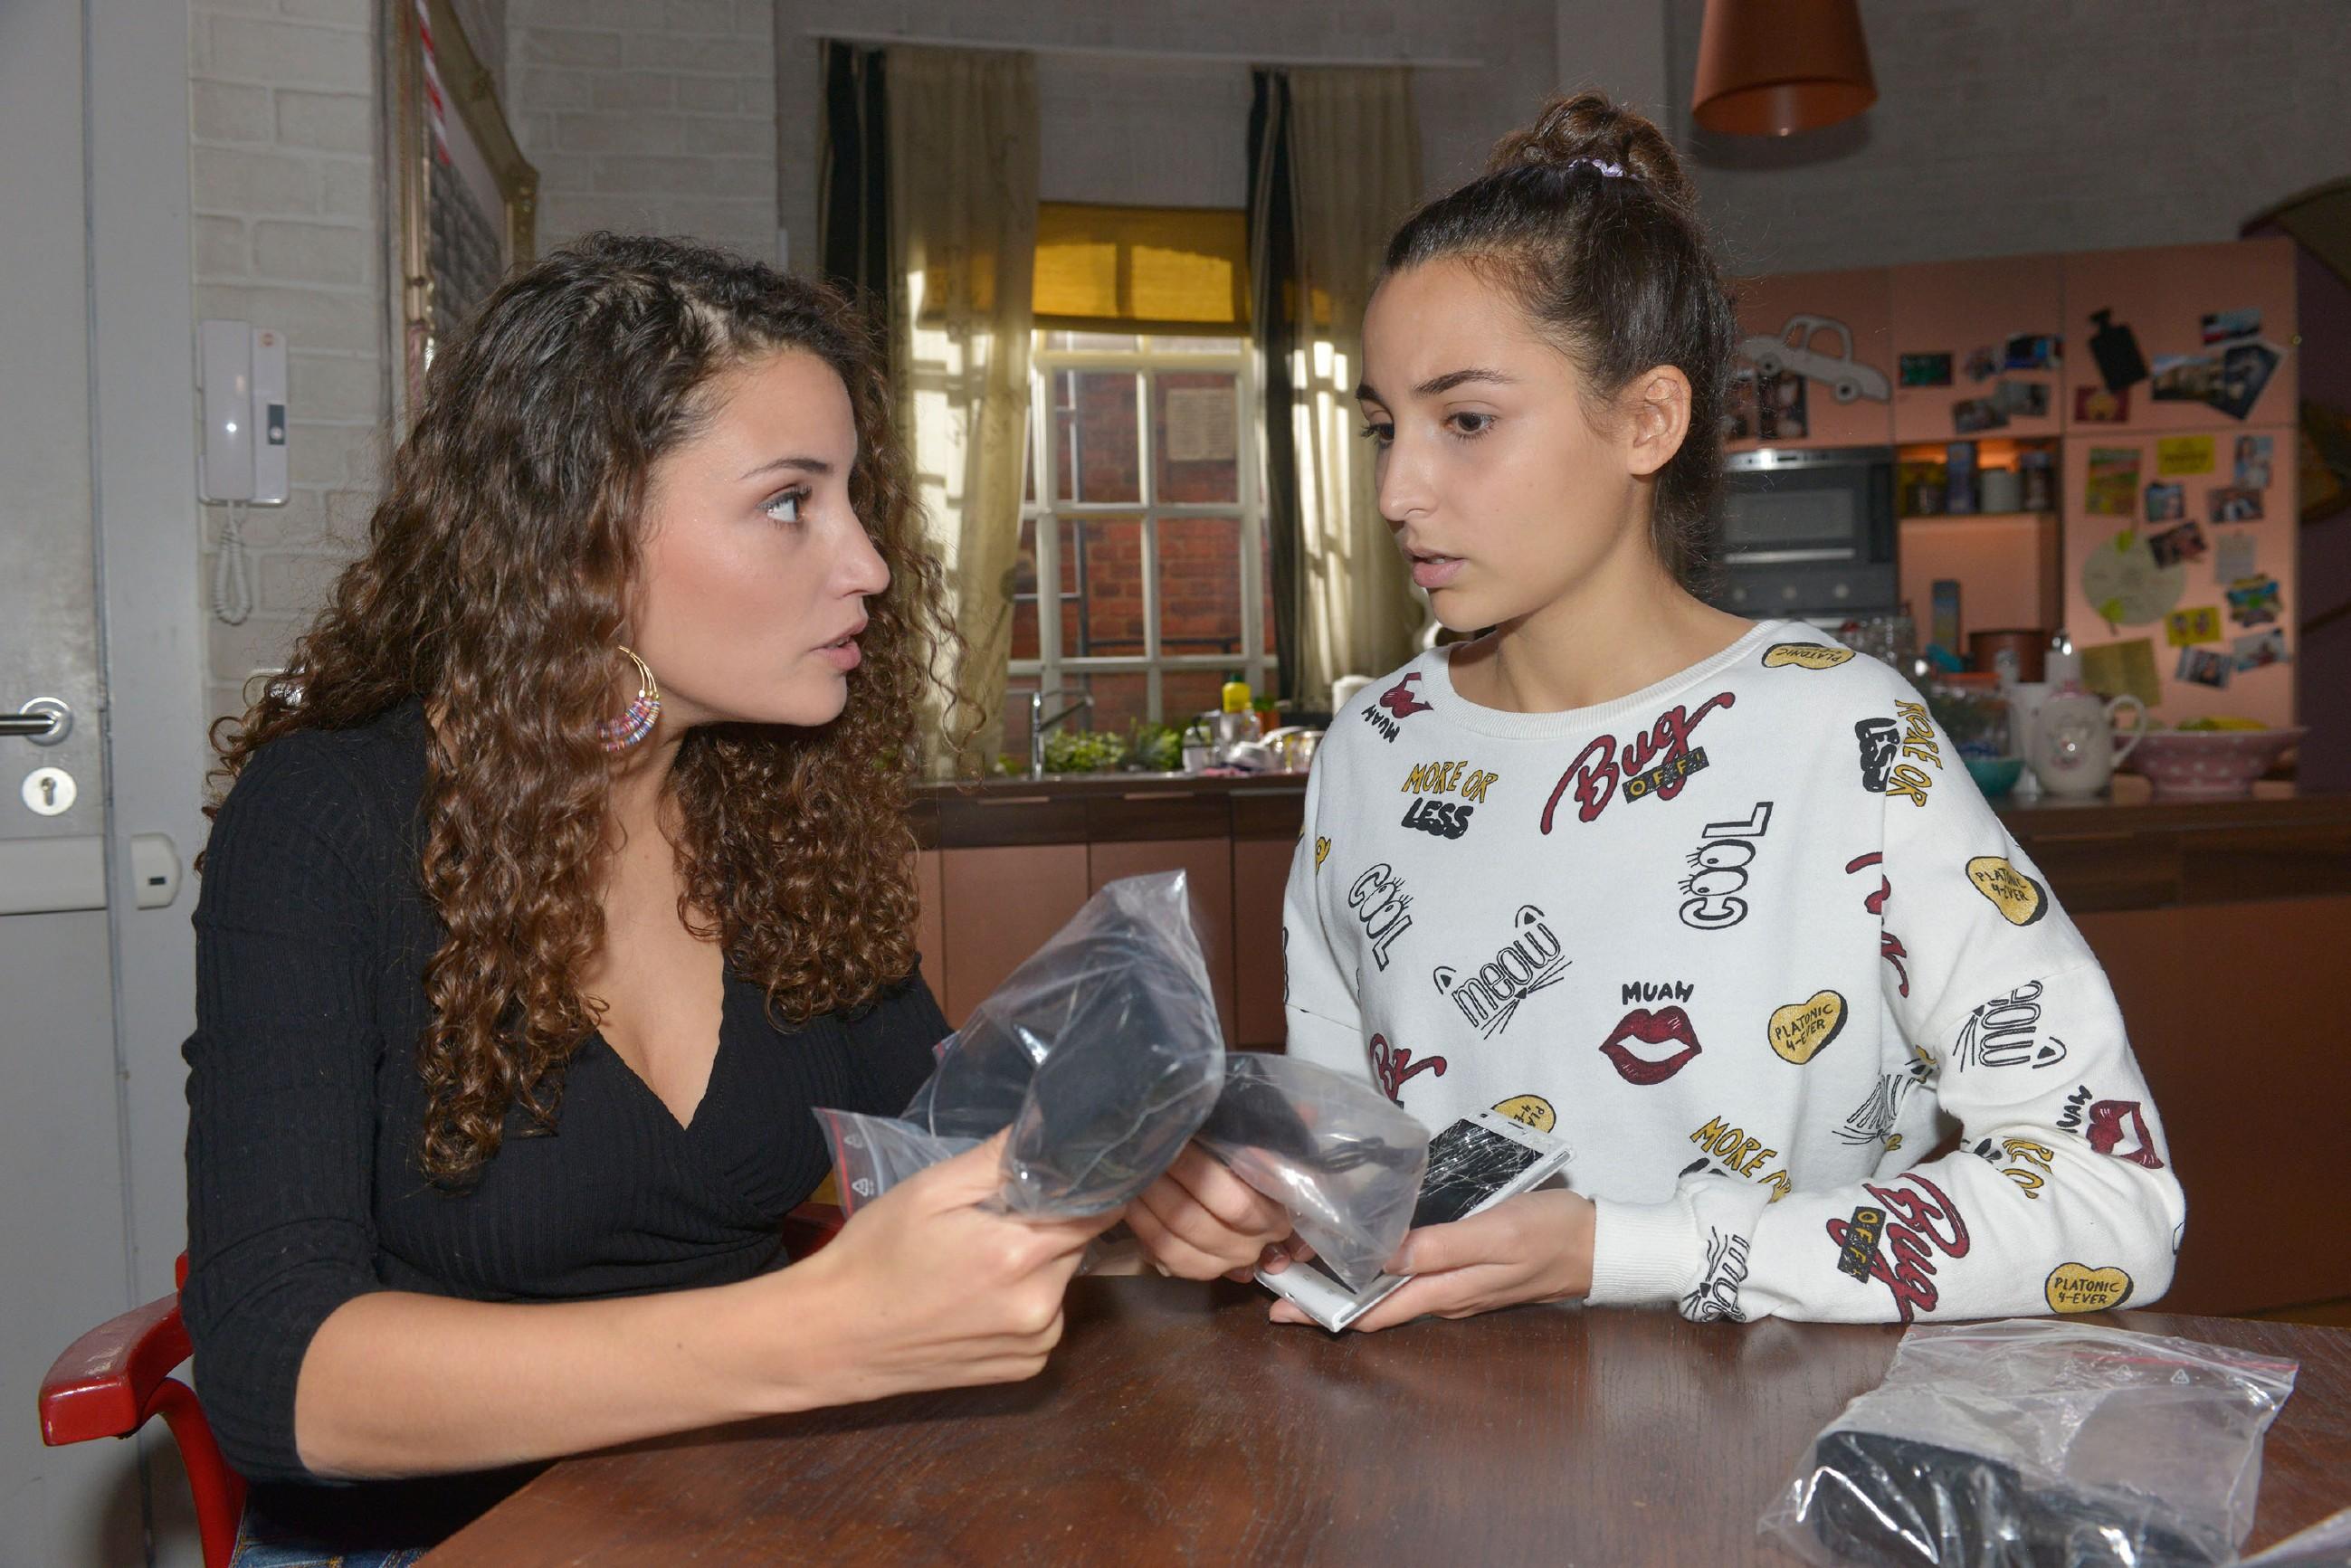 Selma (Rona Özkan, r.) droht mit dem Handy-Handel vor Ayla (Nadine Menz) aufzufliegen... (Quelle: RTL / Rolf Baumgartner)